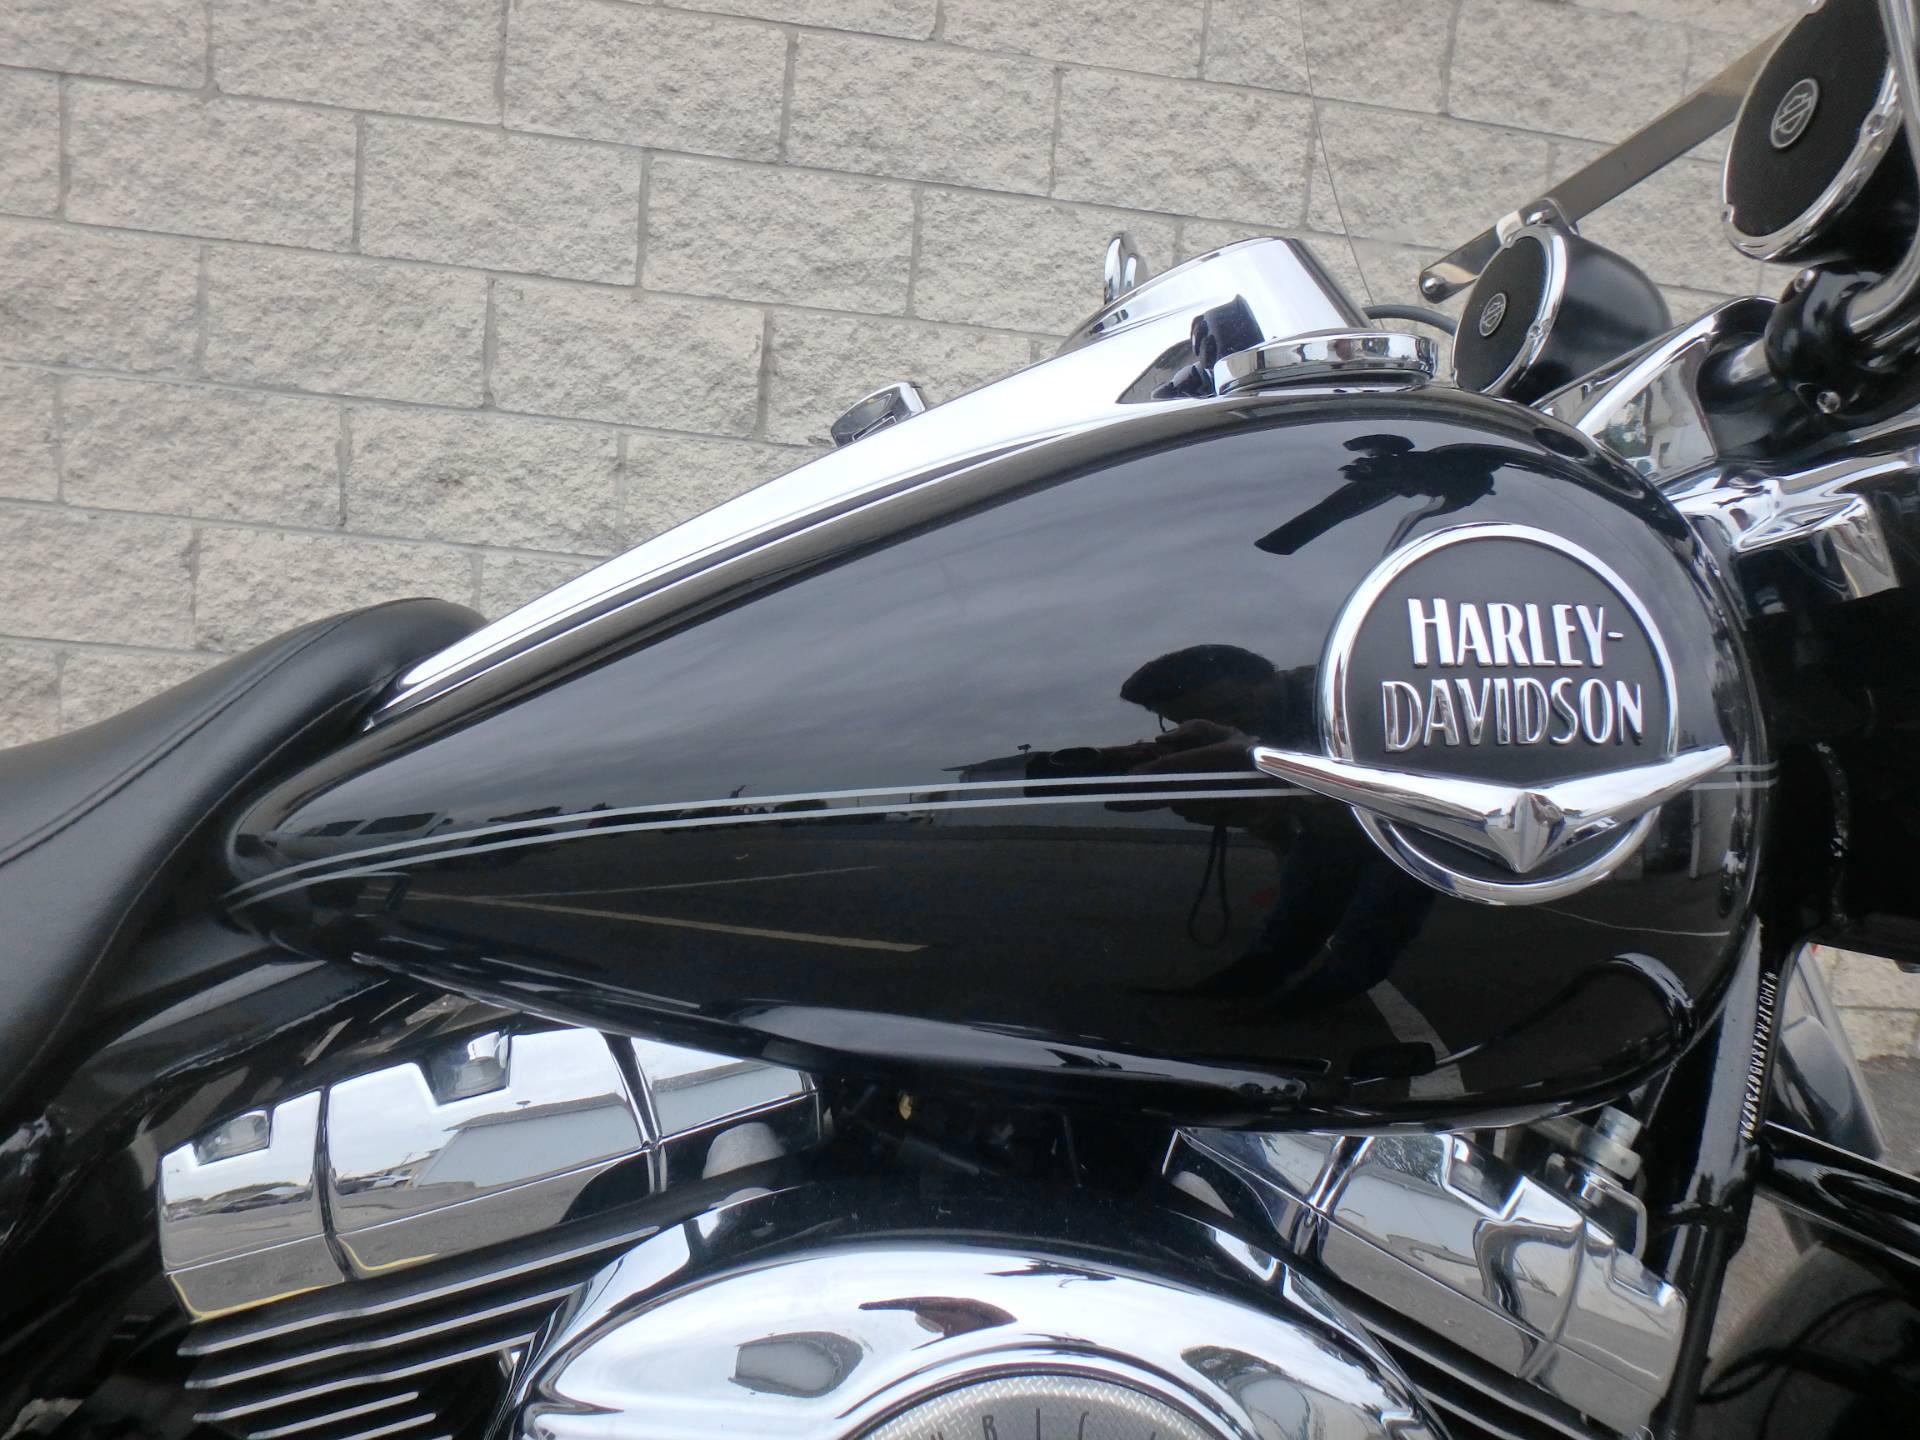 2010 Harley-Davidson Road King Classic 4